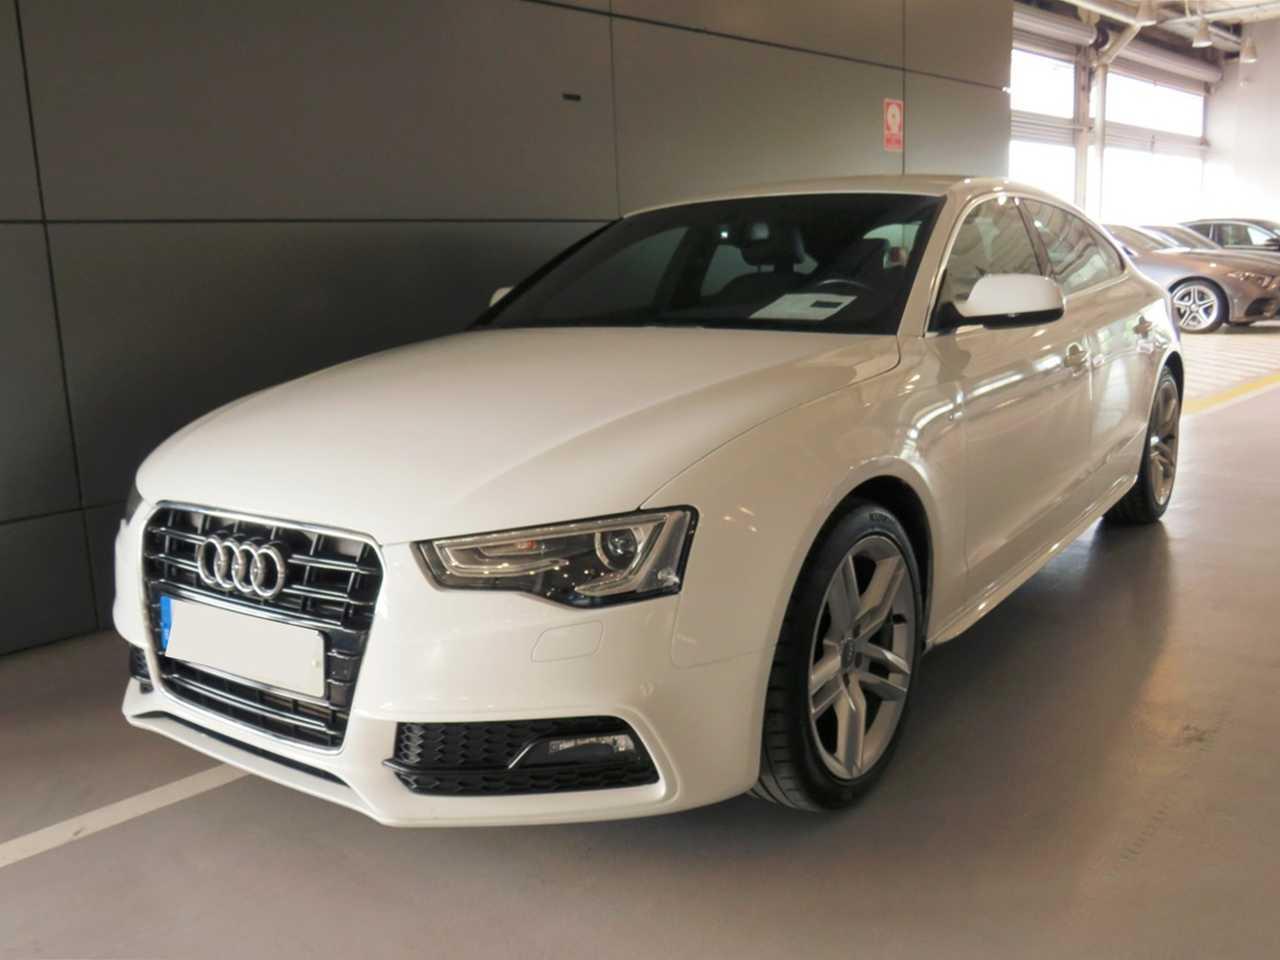 Audi A5 Sportback 2.0 TDI  (110kW) Euro-Norm 5 2013  - Foto 1